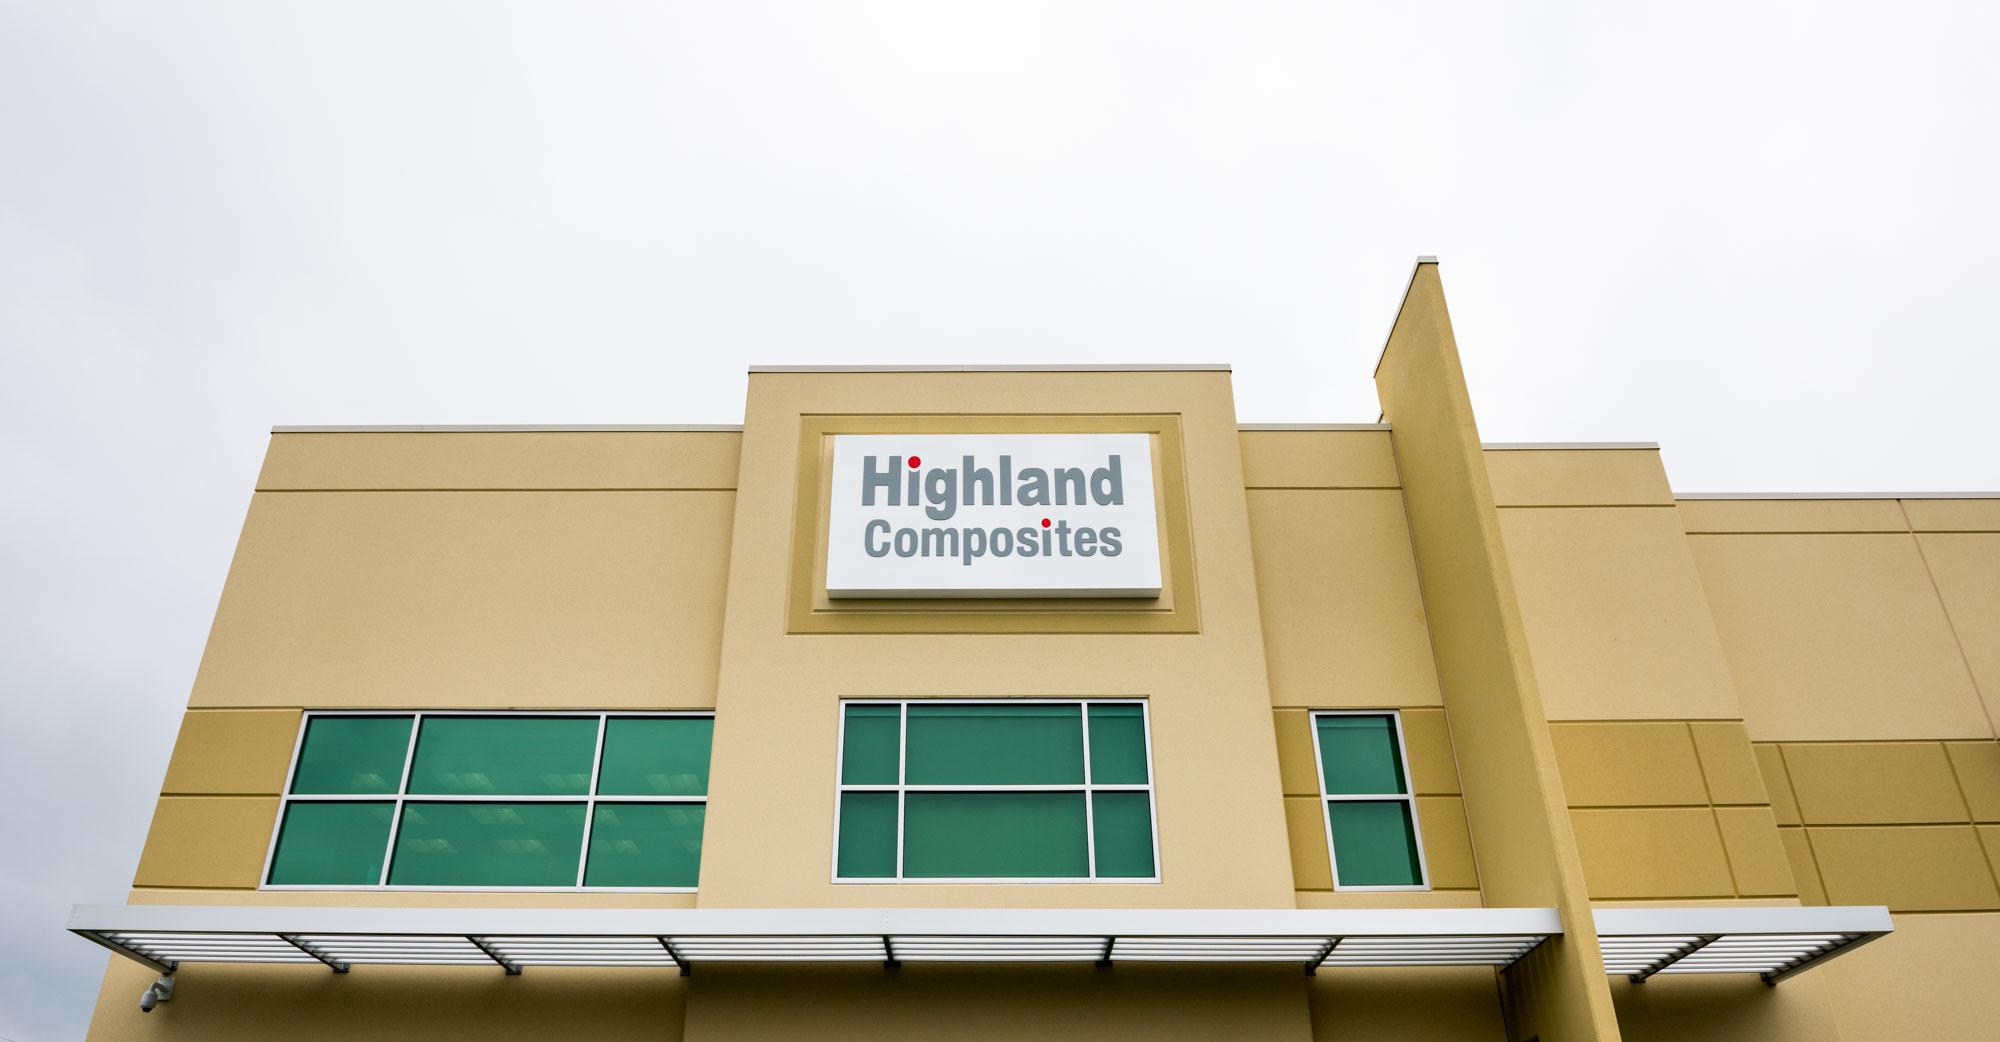 HIGHLAND COMPOSITES